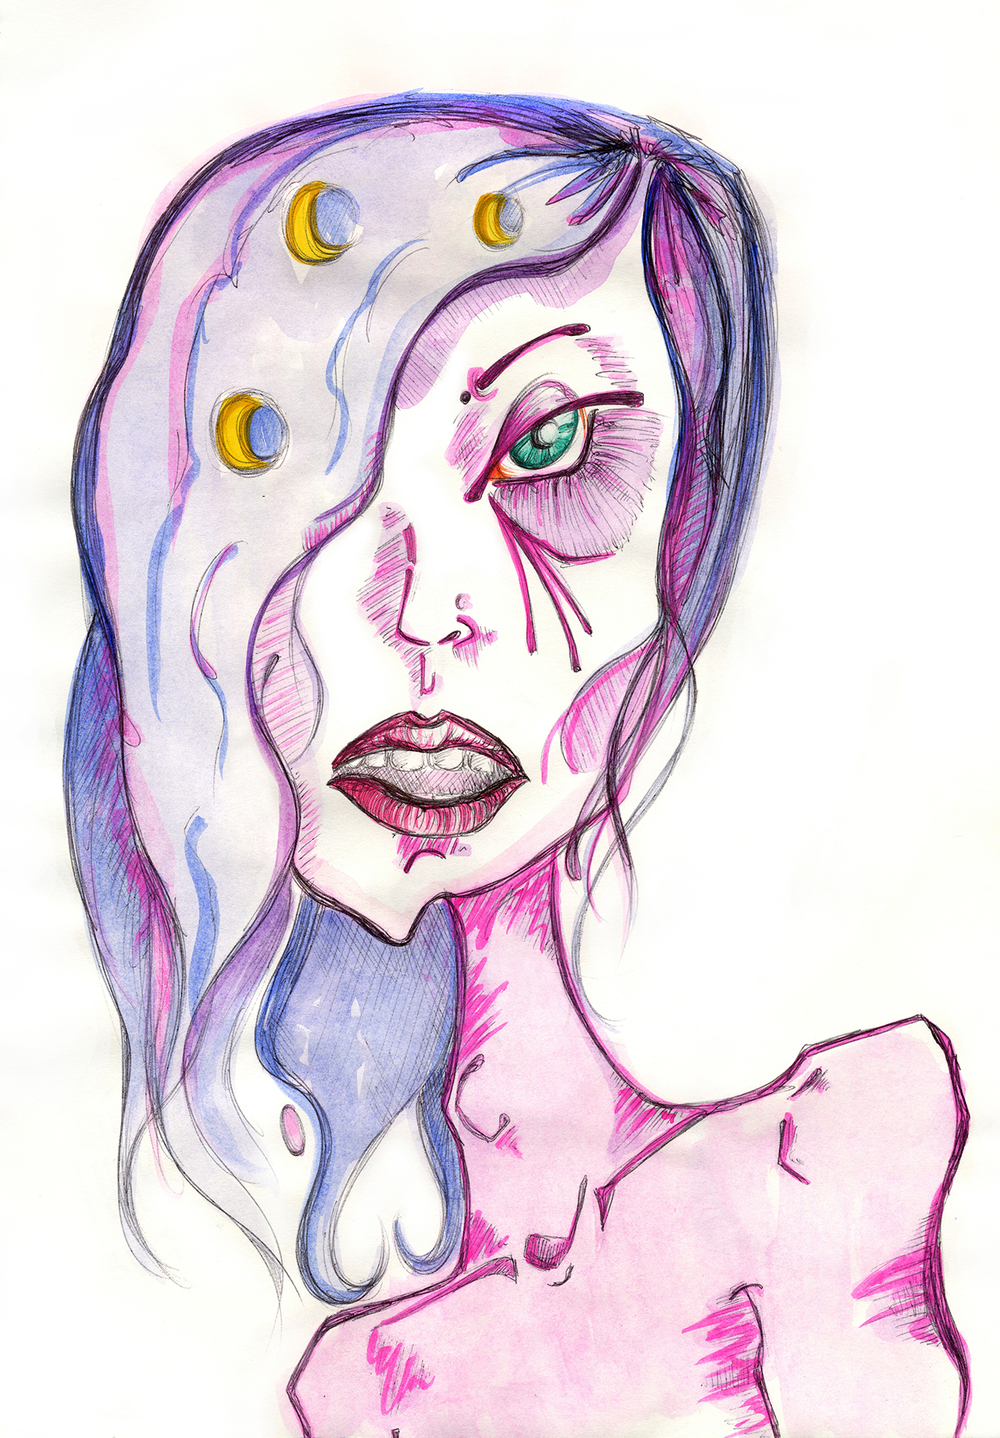 "3 Moons In Her Hair  Pen, Watercolor + Colored Pencil,  9 x 12"" / Geena Matuson @geenamatuson"